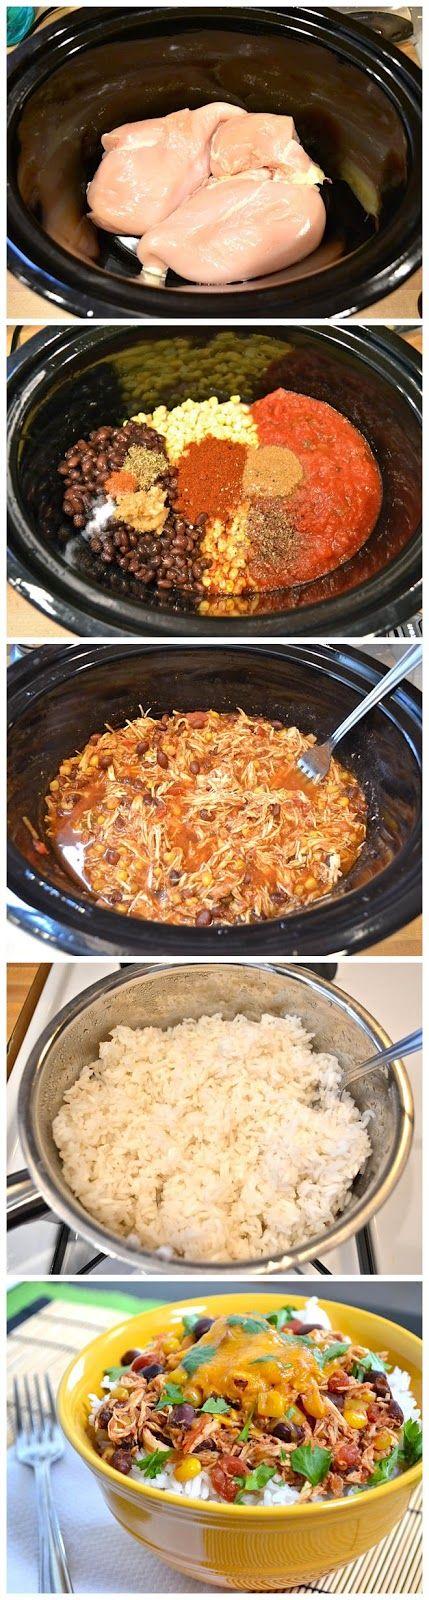 crock pot taco chicken bowls. This looks soooo yummy!